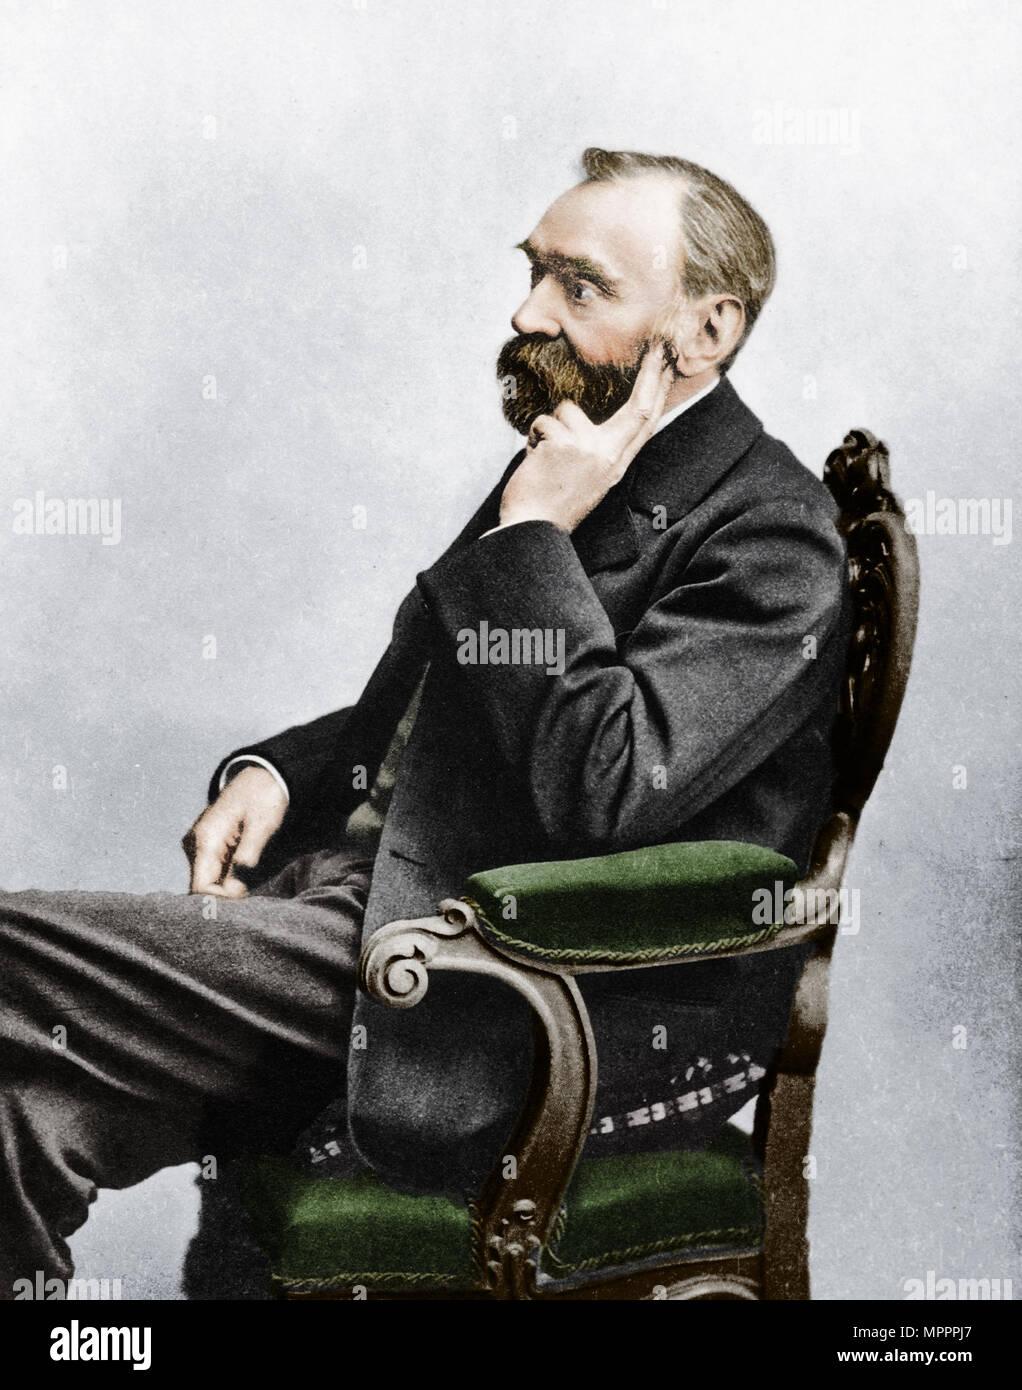 Alfred Bernhard Nobel, c 1880. Artist: Unbekannt. Stockbild